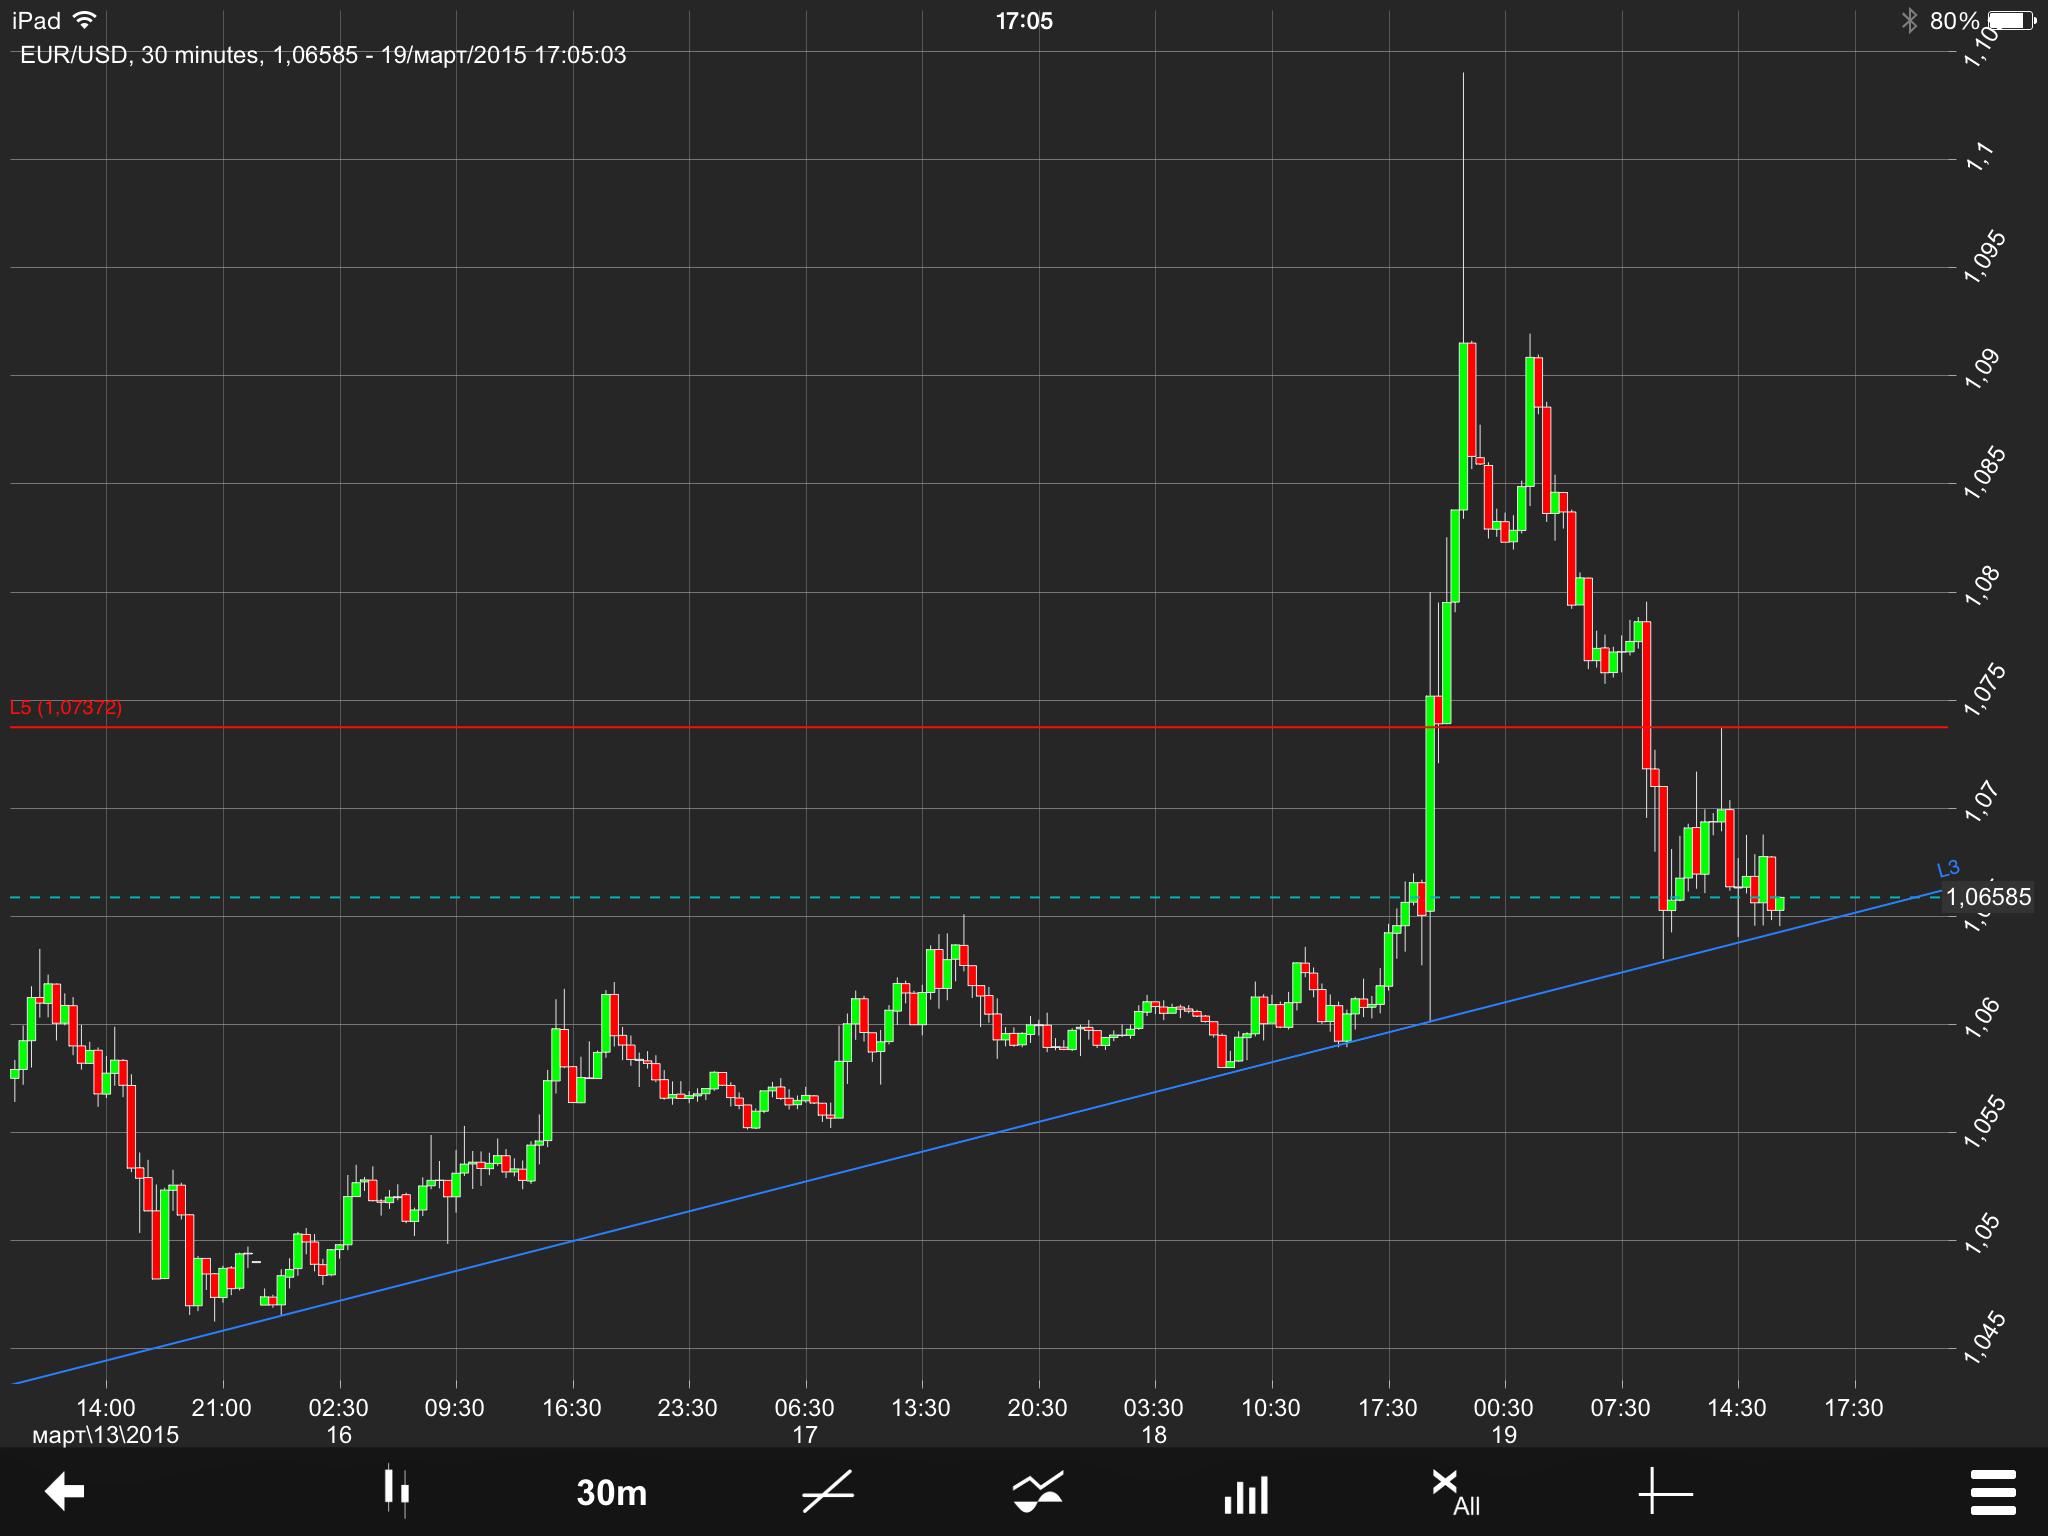 EUR/USD Chart 19 Mar 2015